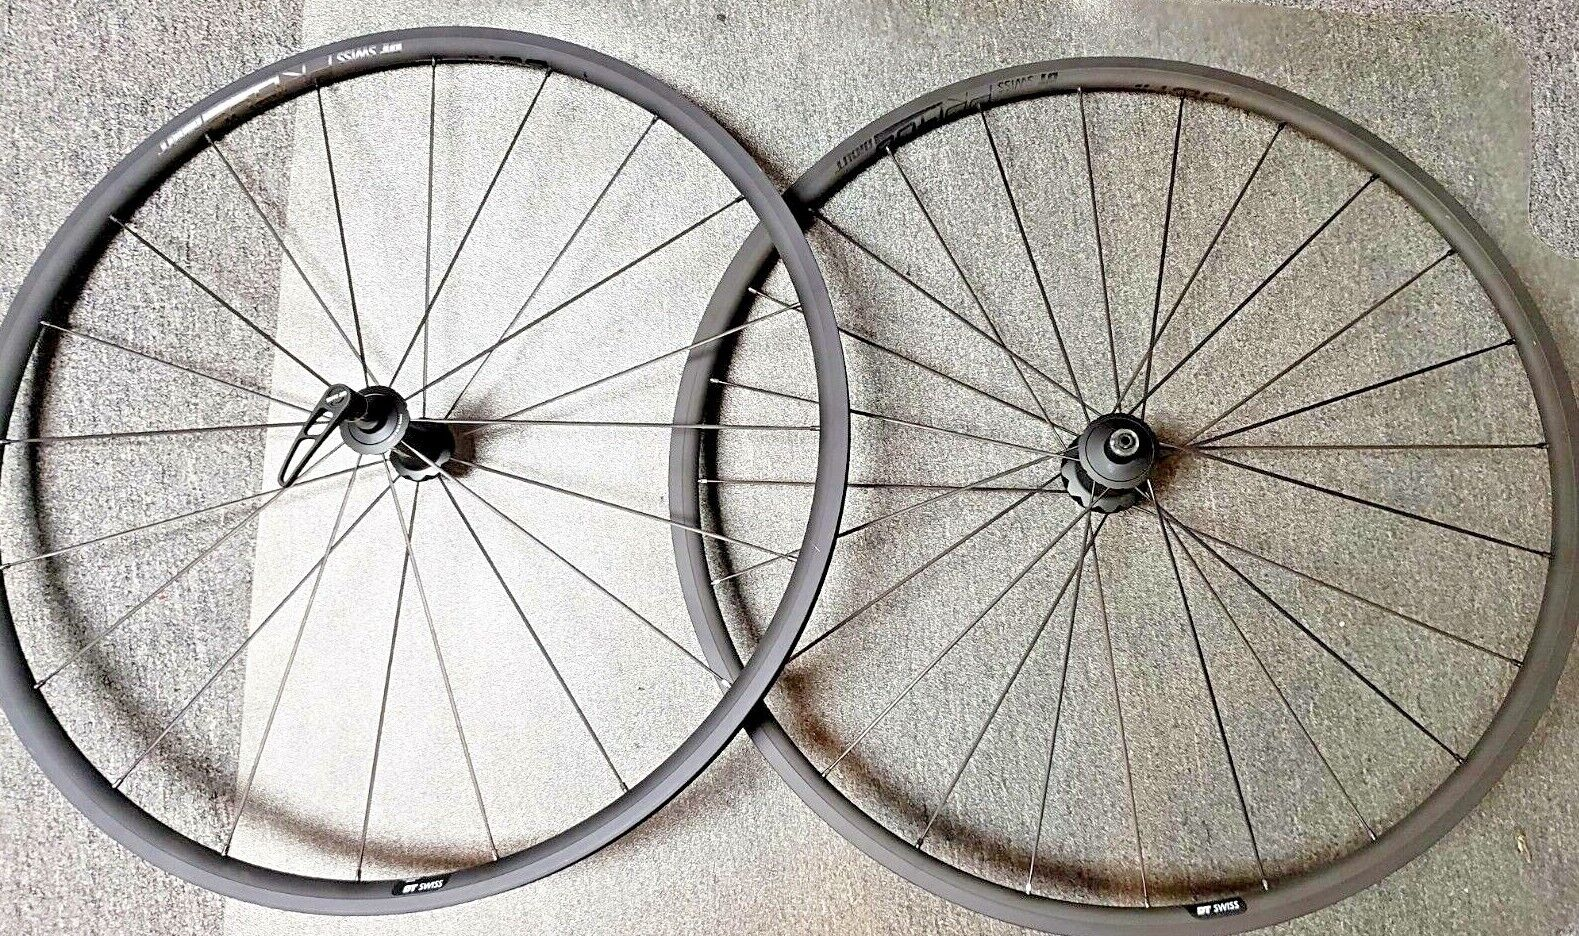 DT Swiss PR1400 DiCut Oxic wheel set